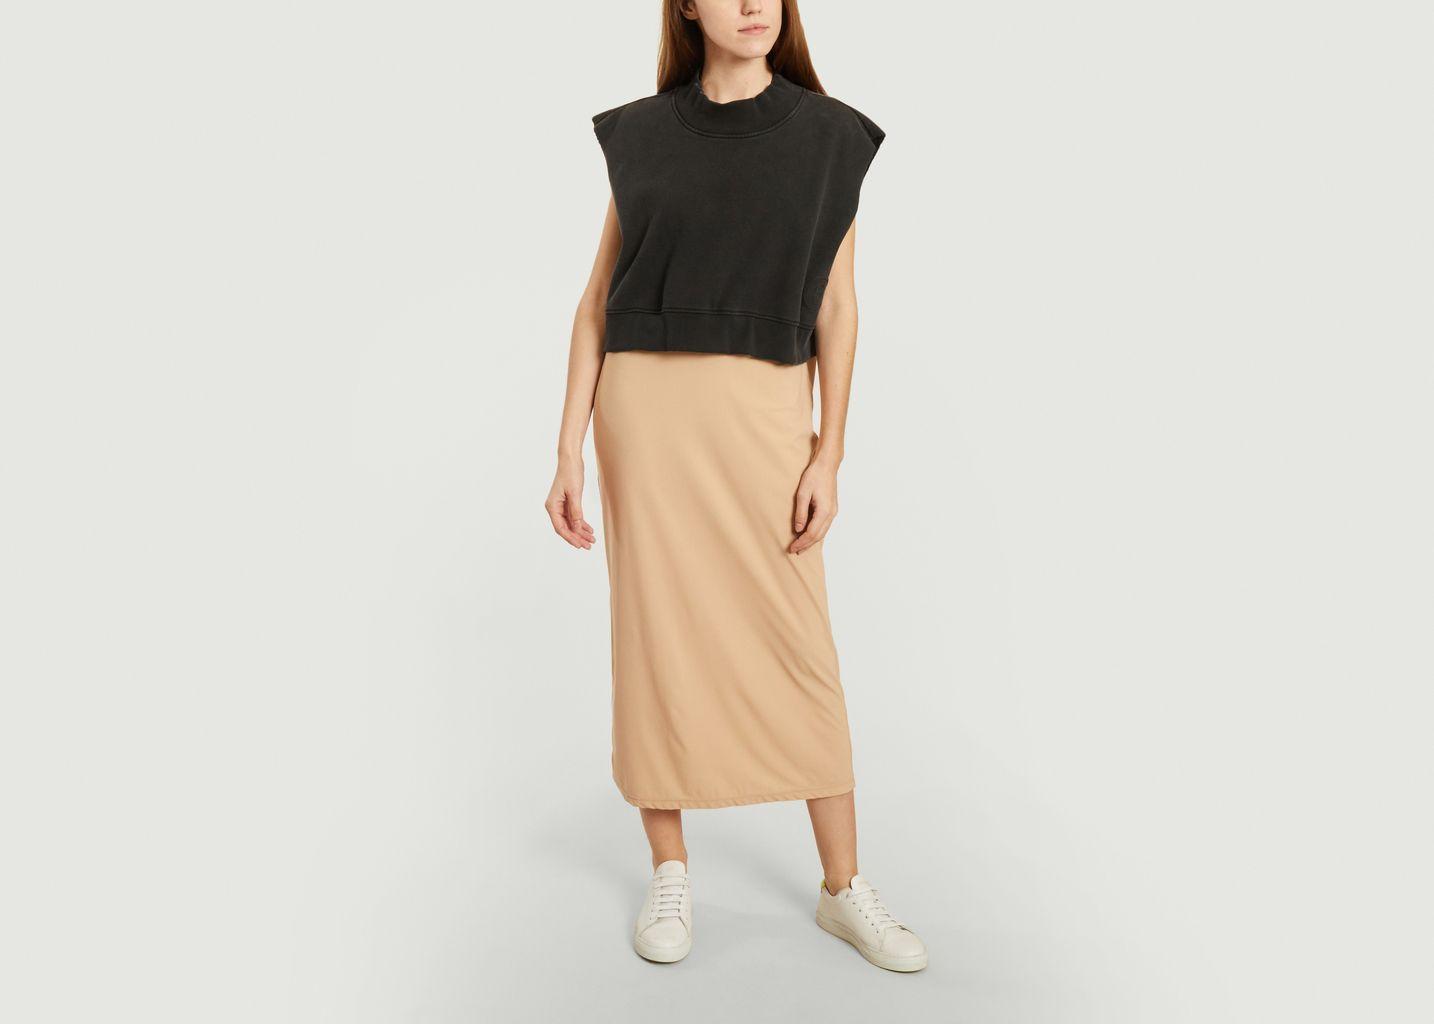 Pull Garment - MM6 Maison Margiela